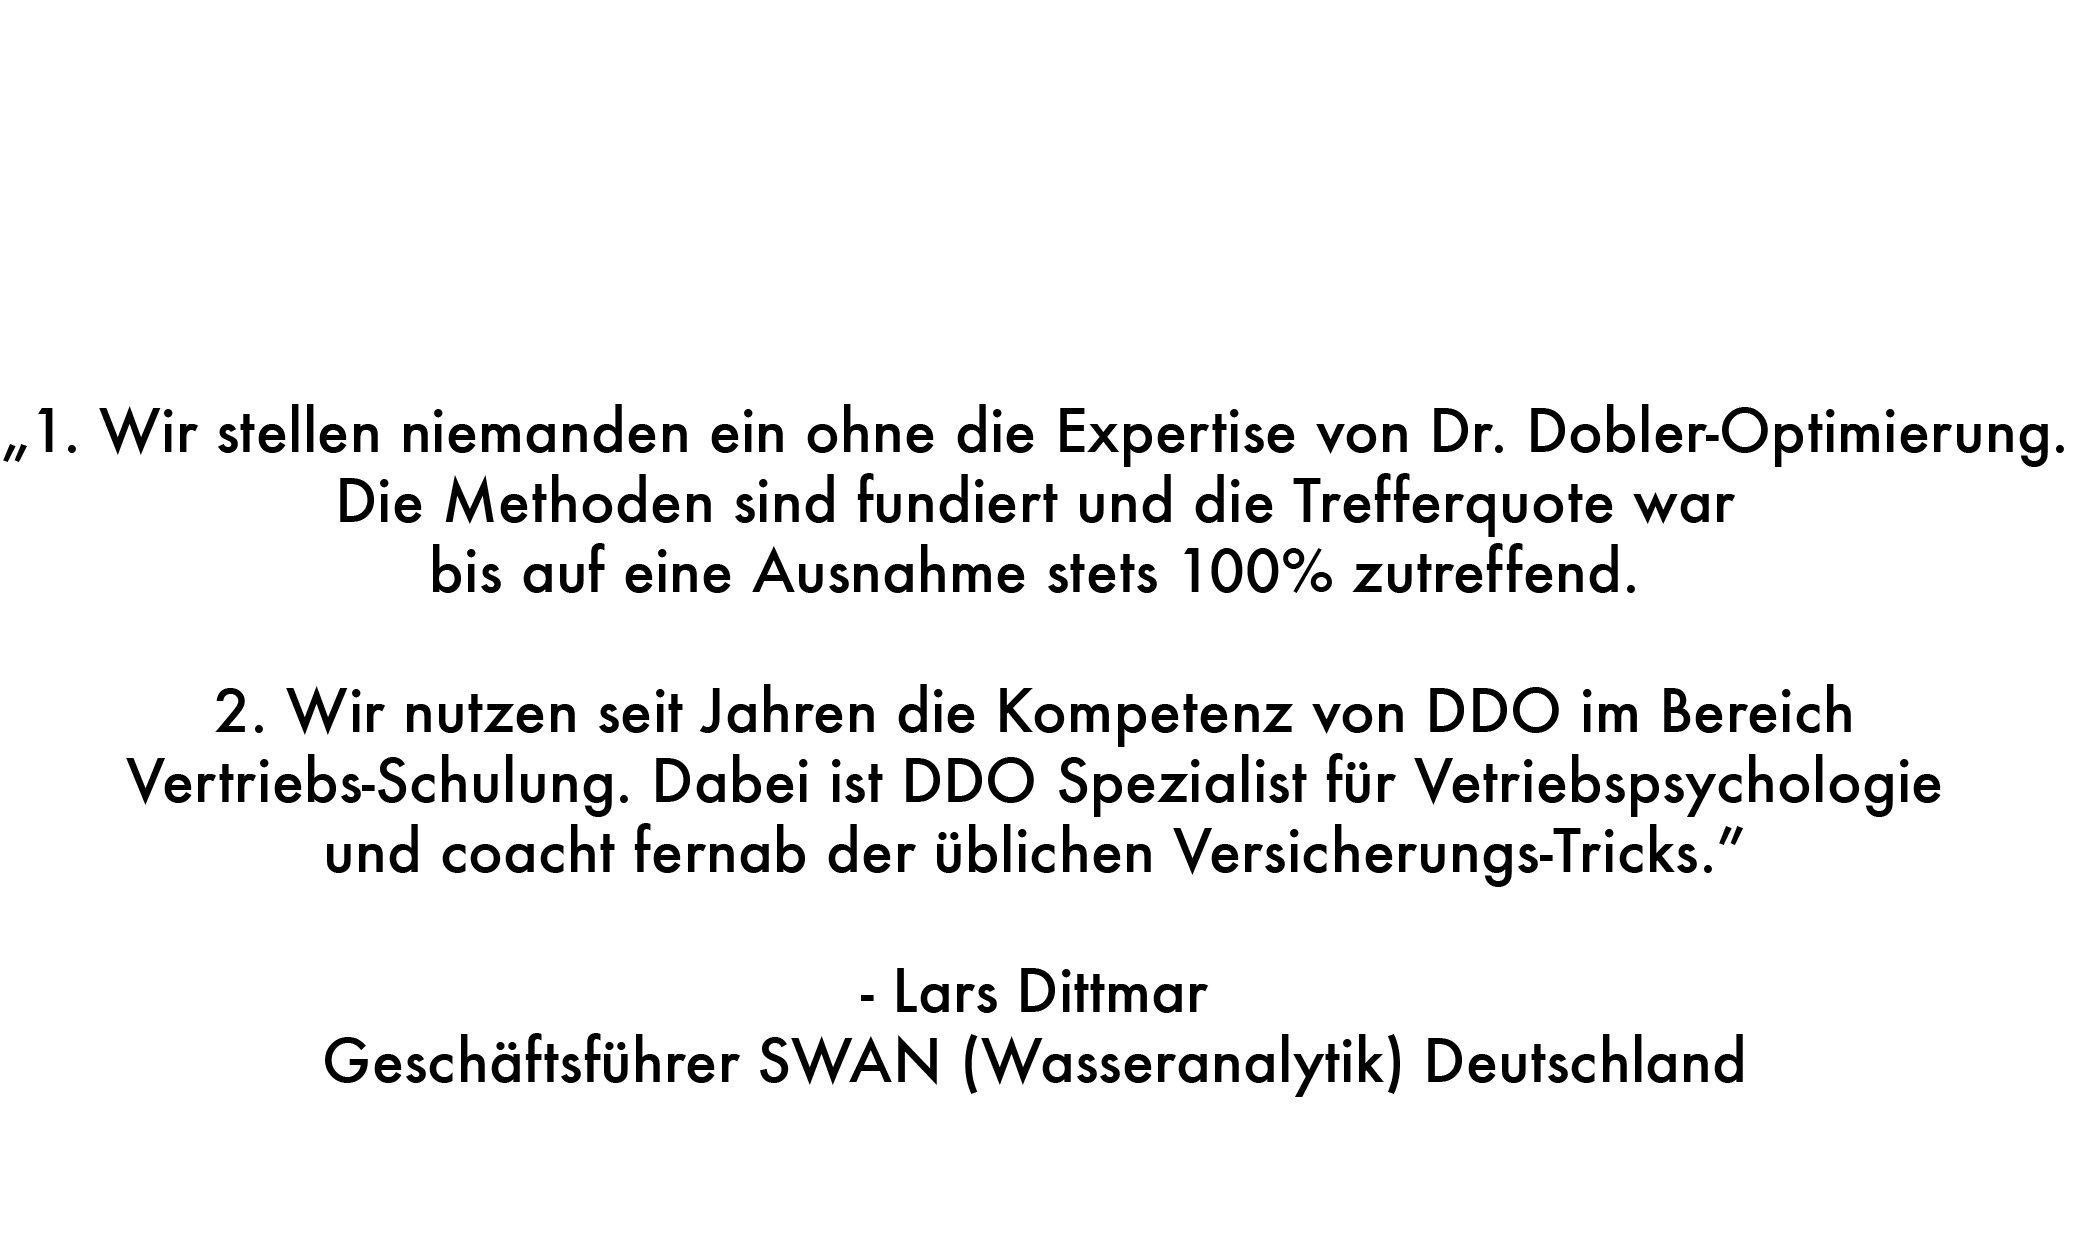 Webseite_Referenzen_LarsDittmar.png